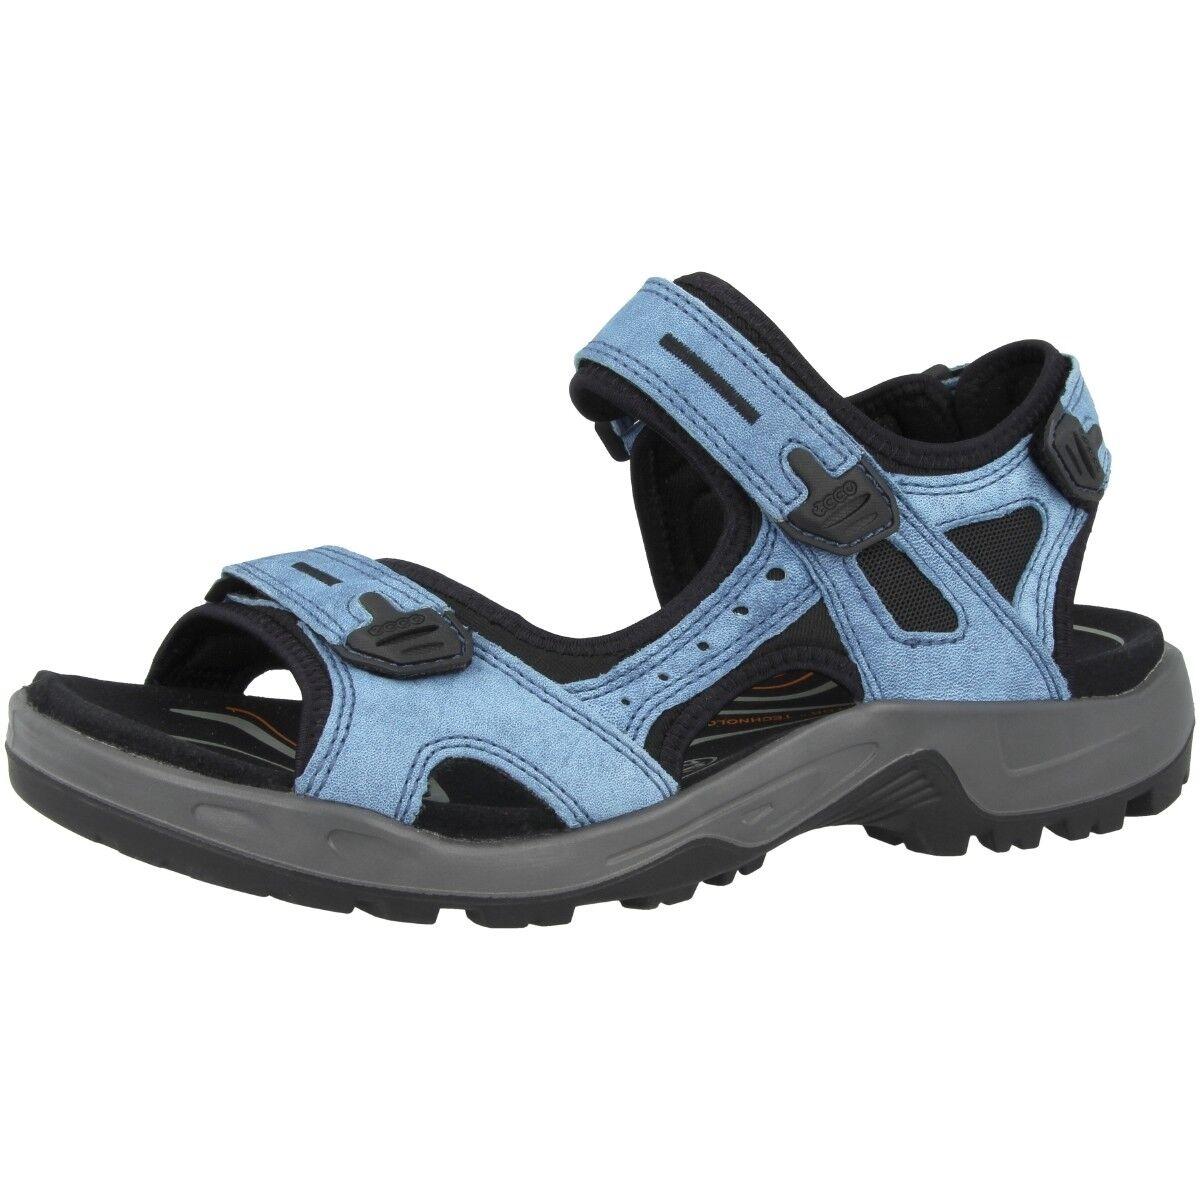 Ecco Offroad Yucatan Homme Sandales chaussures de Trekking Indigo 822094-02321